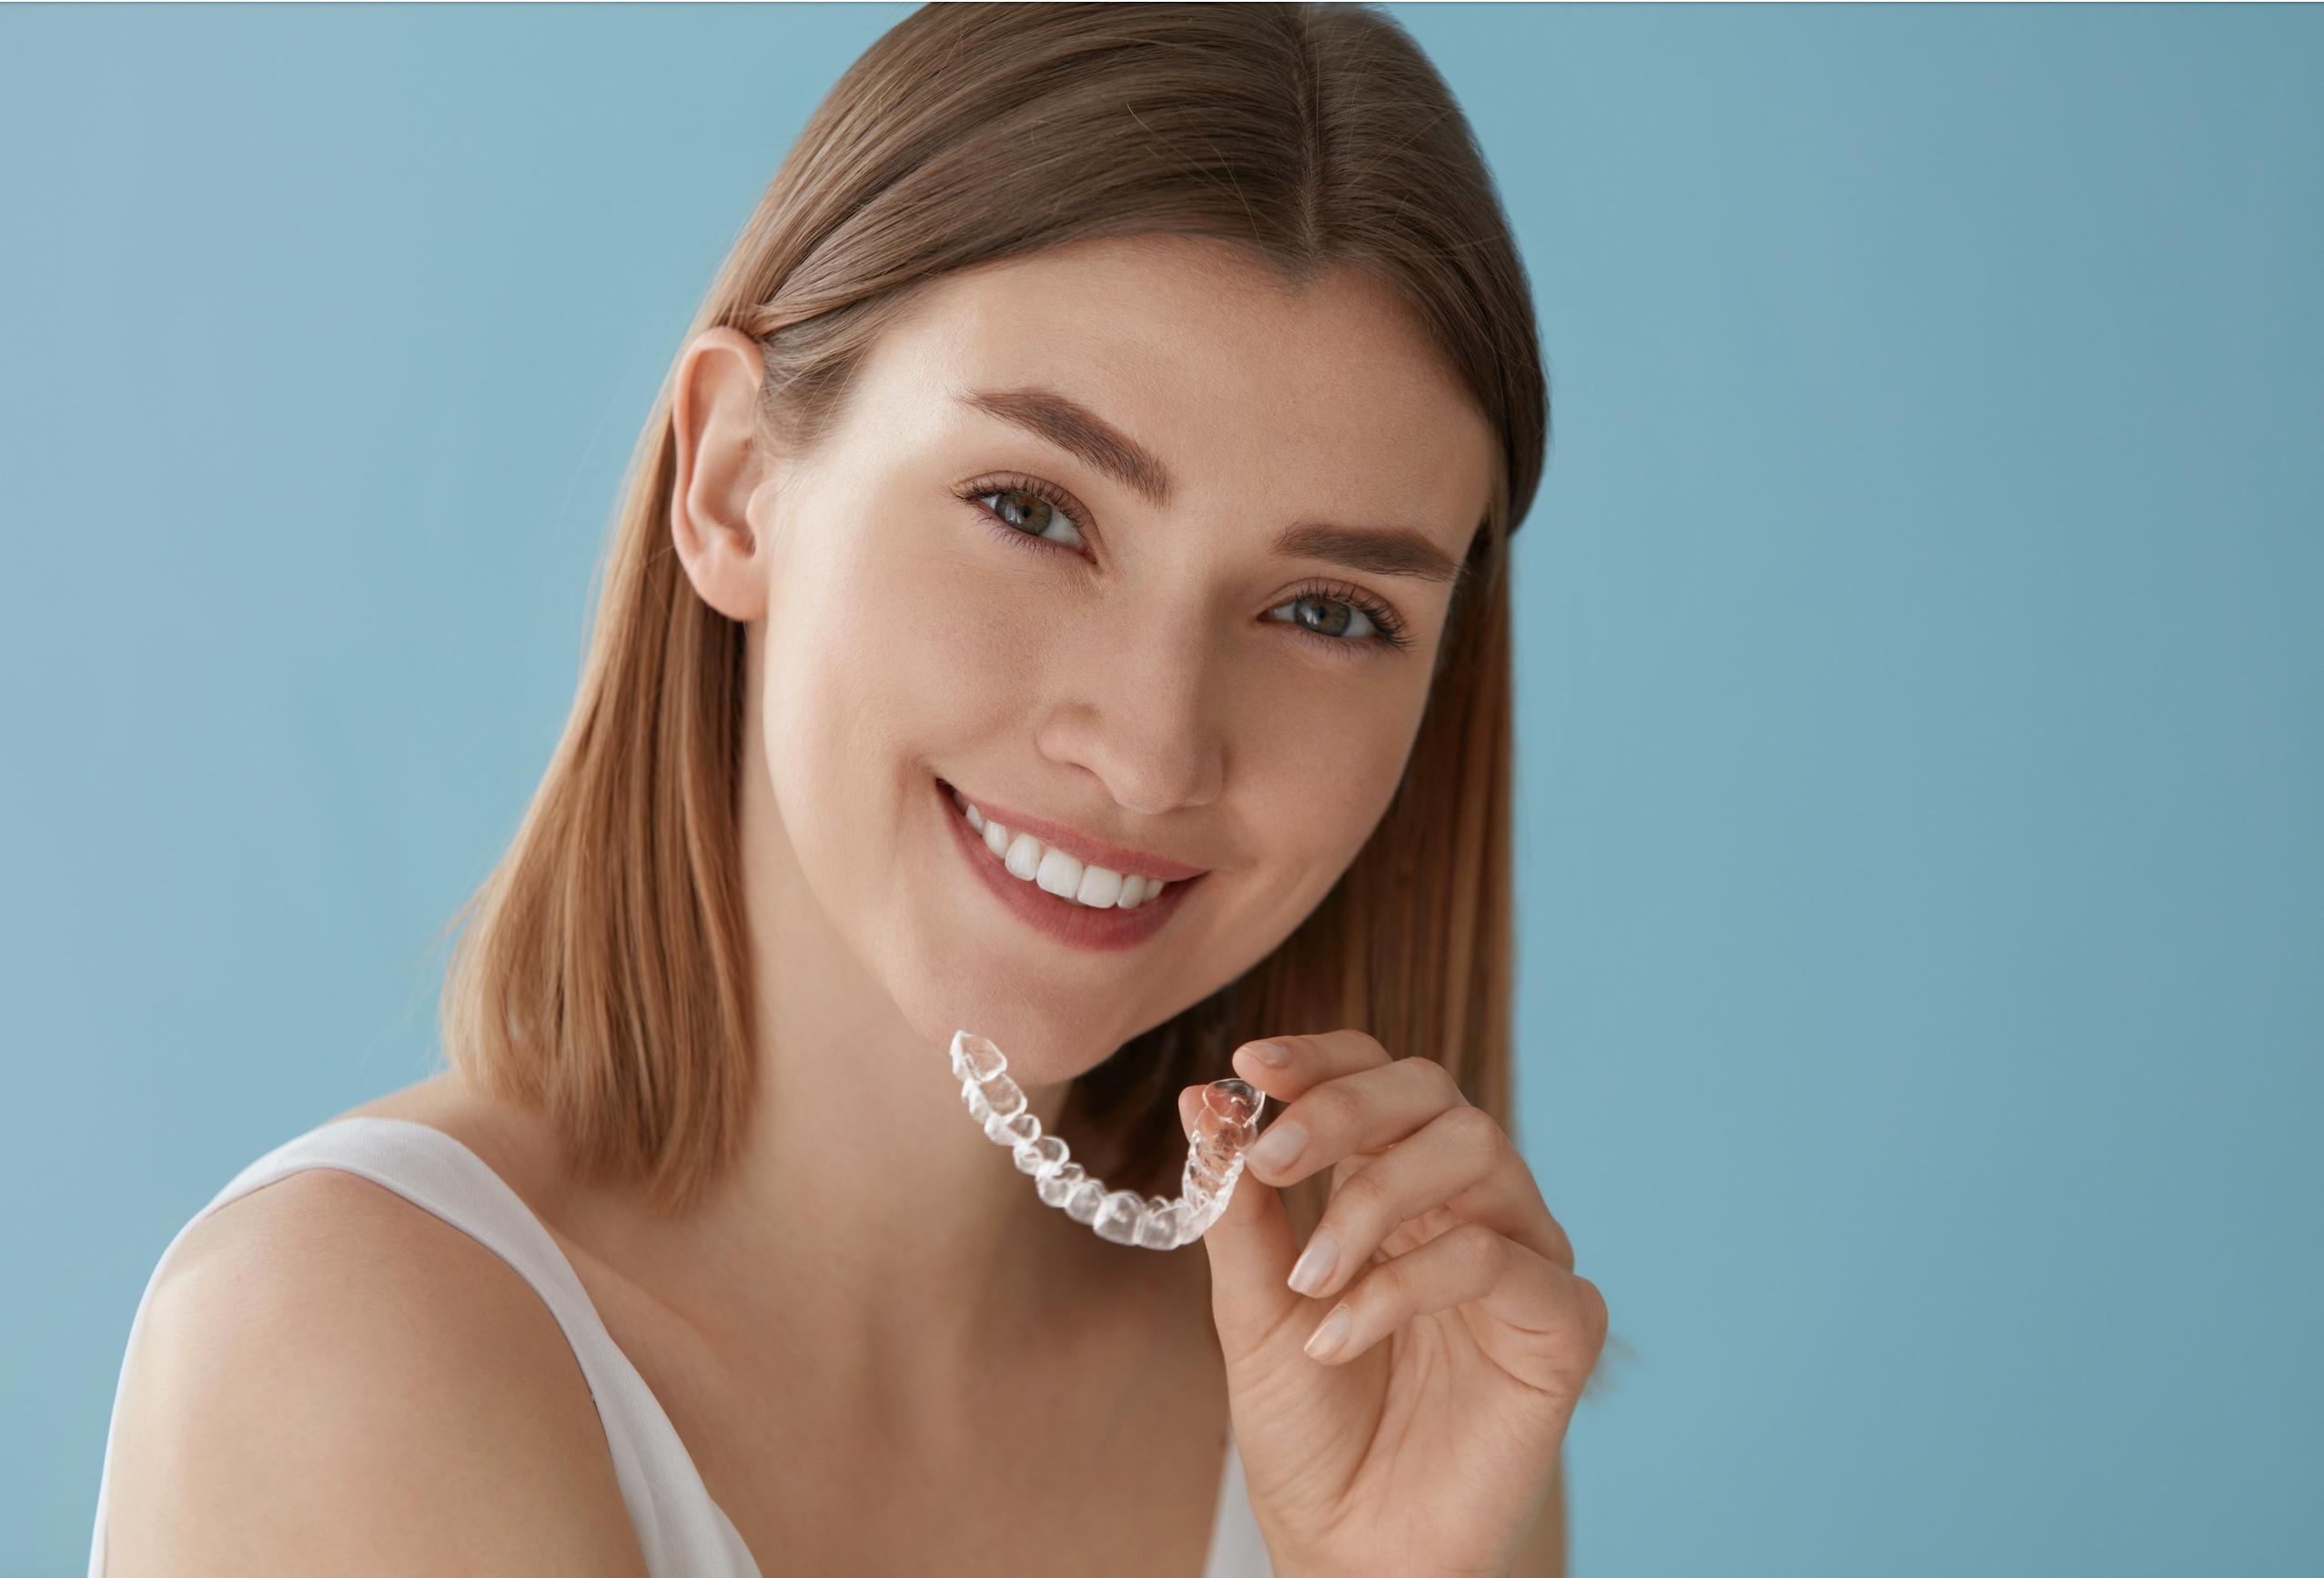 Clear aligners perth orthodontics